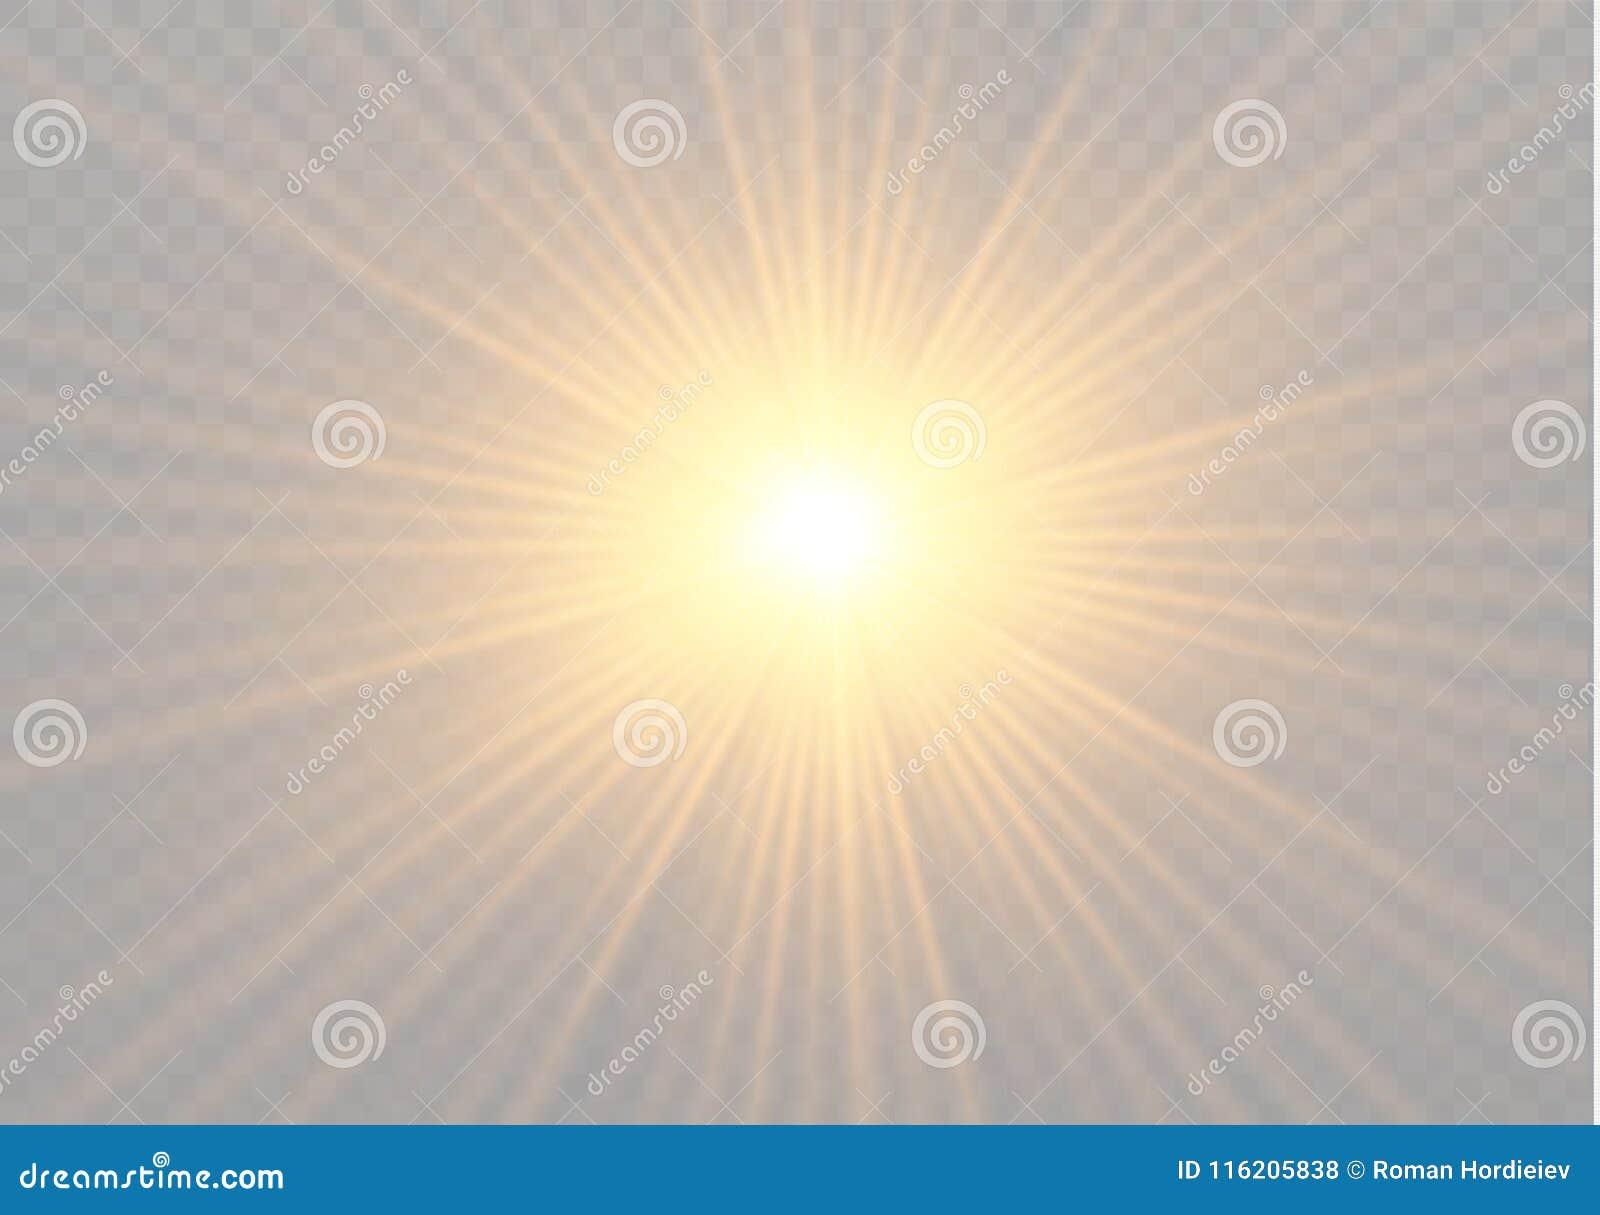 Yellow Glowing Light Burst Explosion On Transparent Background